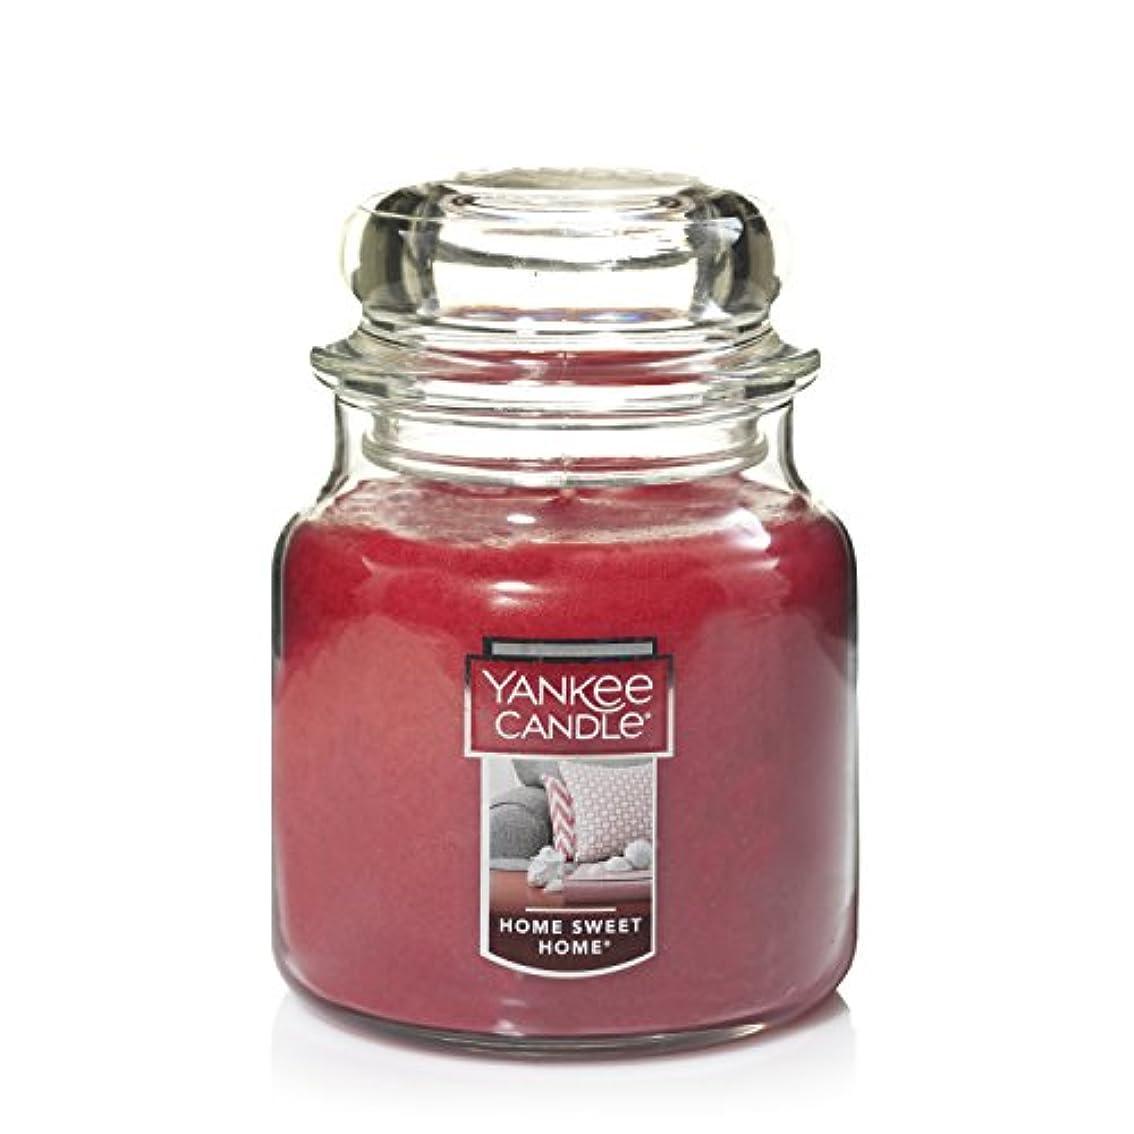 Yankee Candle Home Sweet Home Medium Jar 14.5oz Candle One レッド 11497-YC